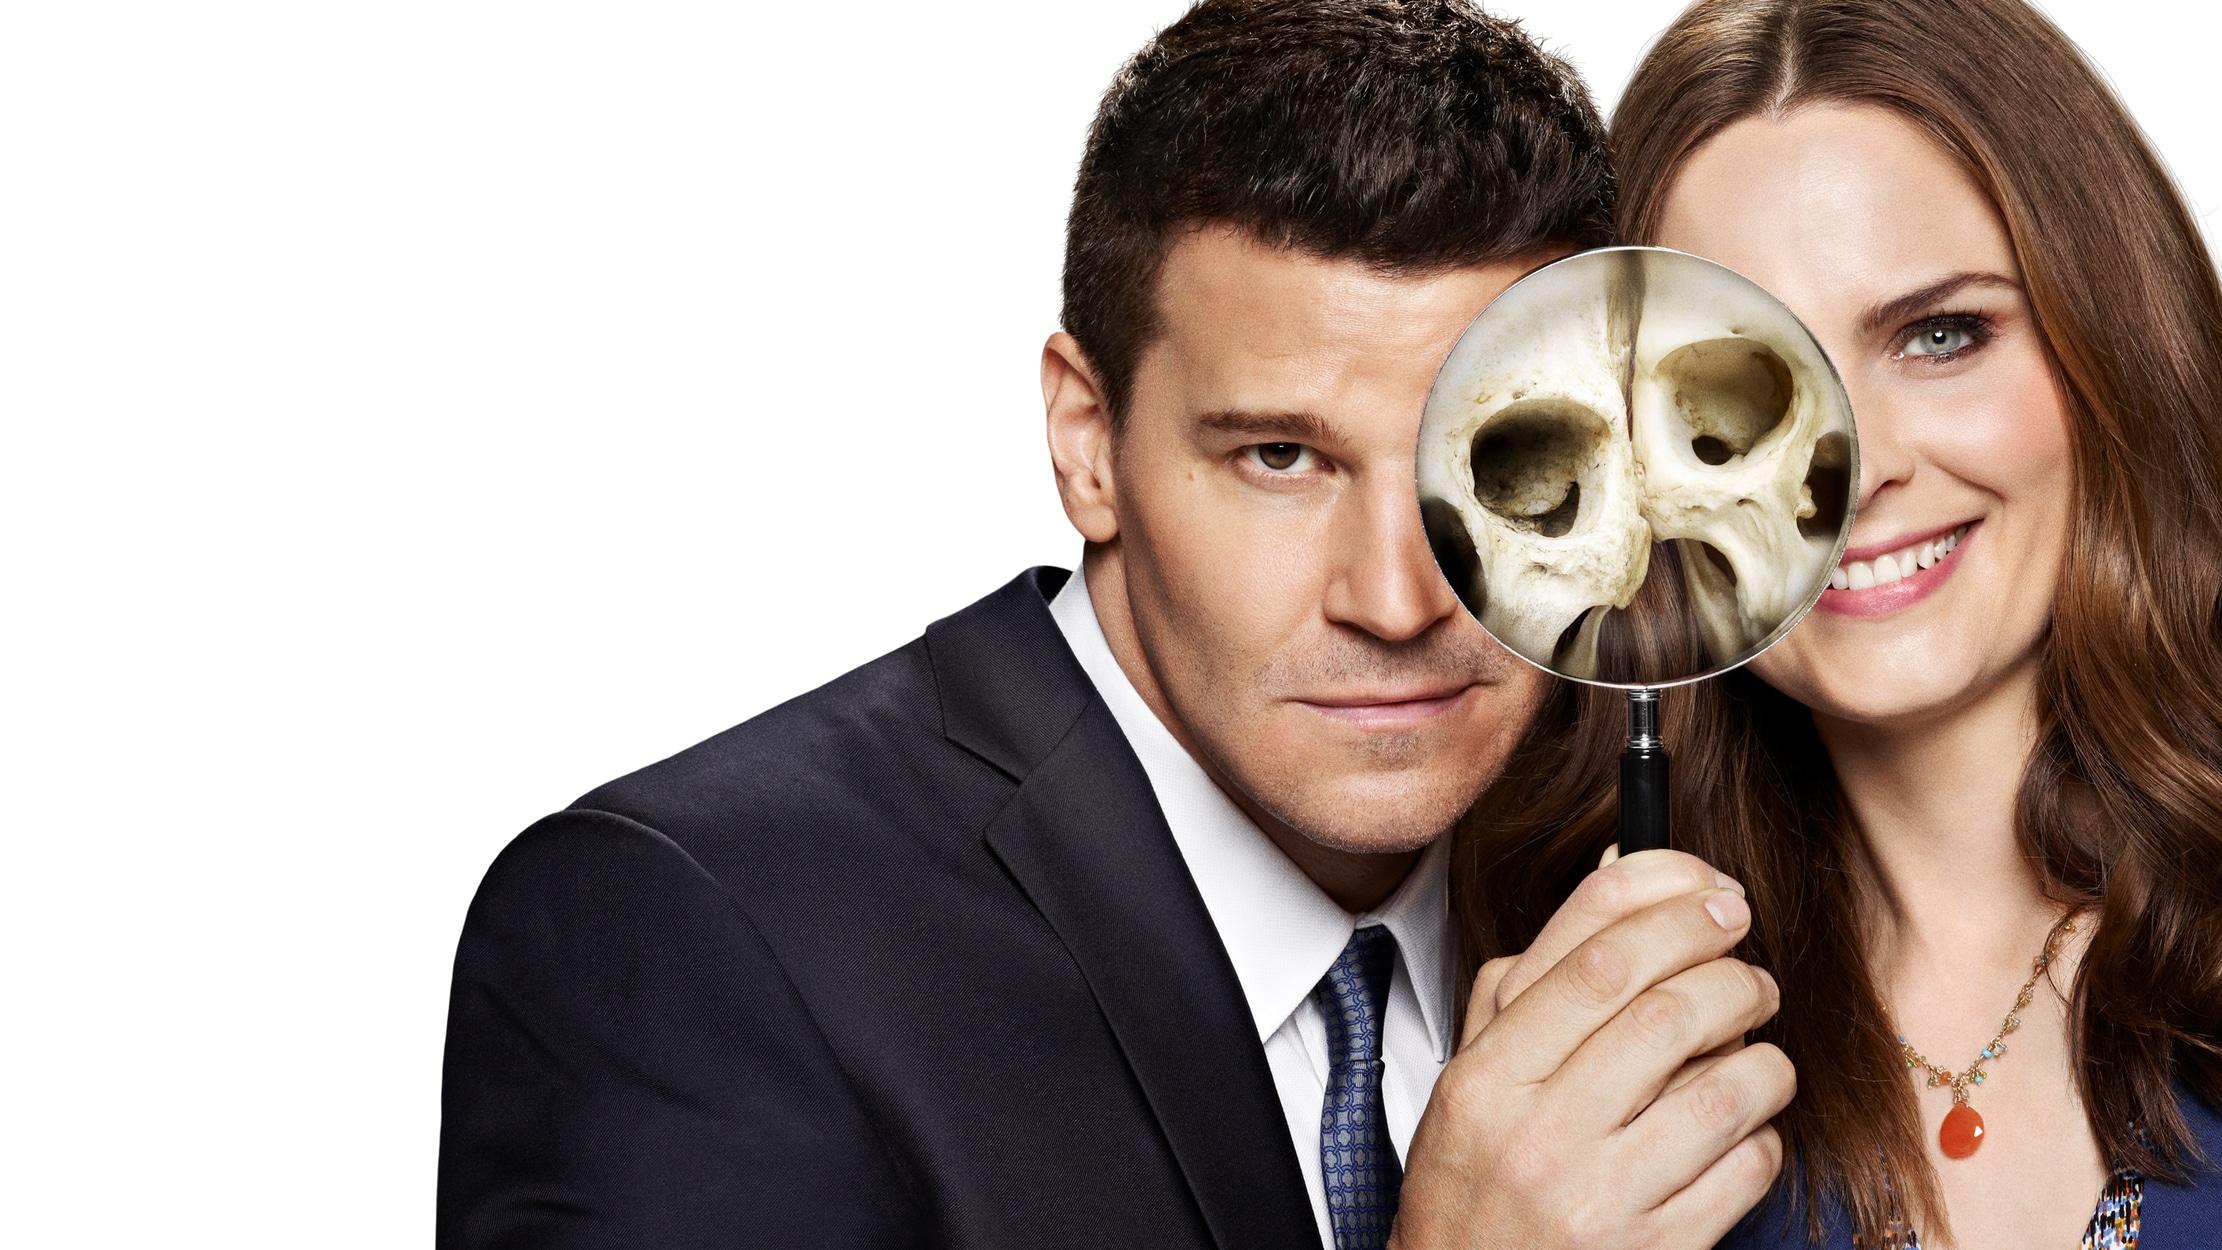 Bones seriesDetail